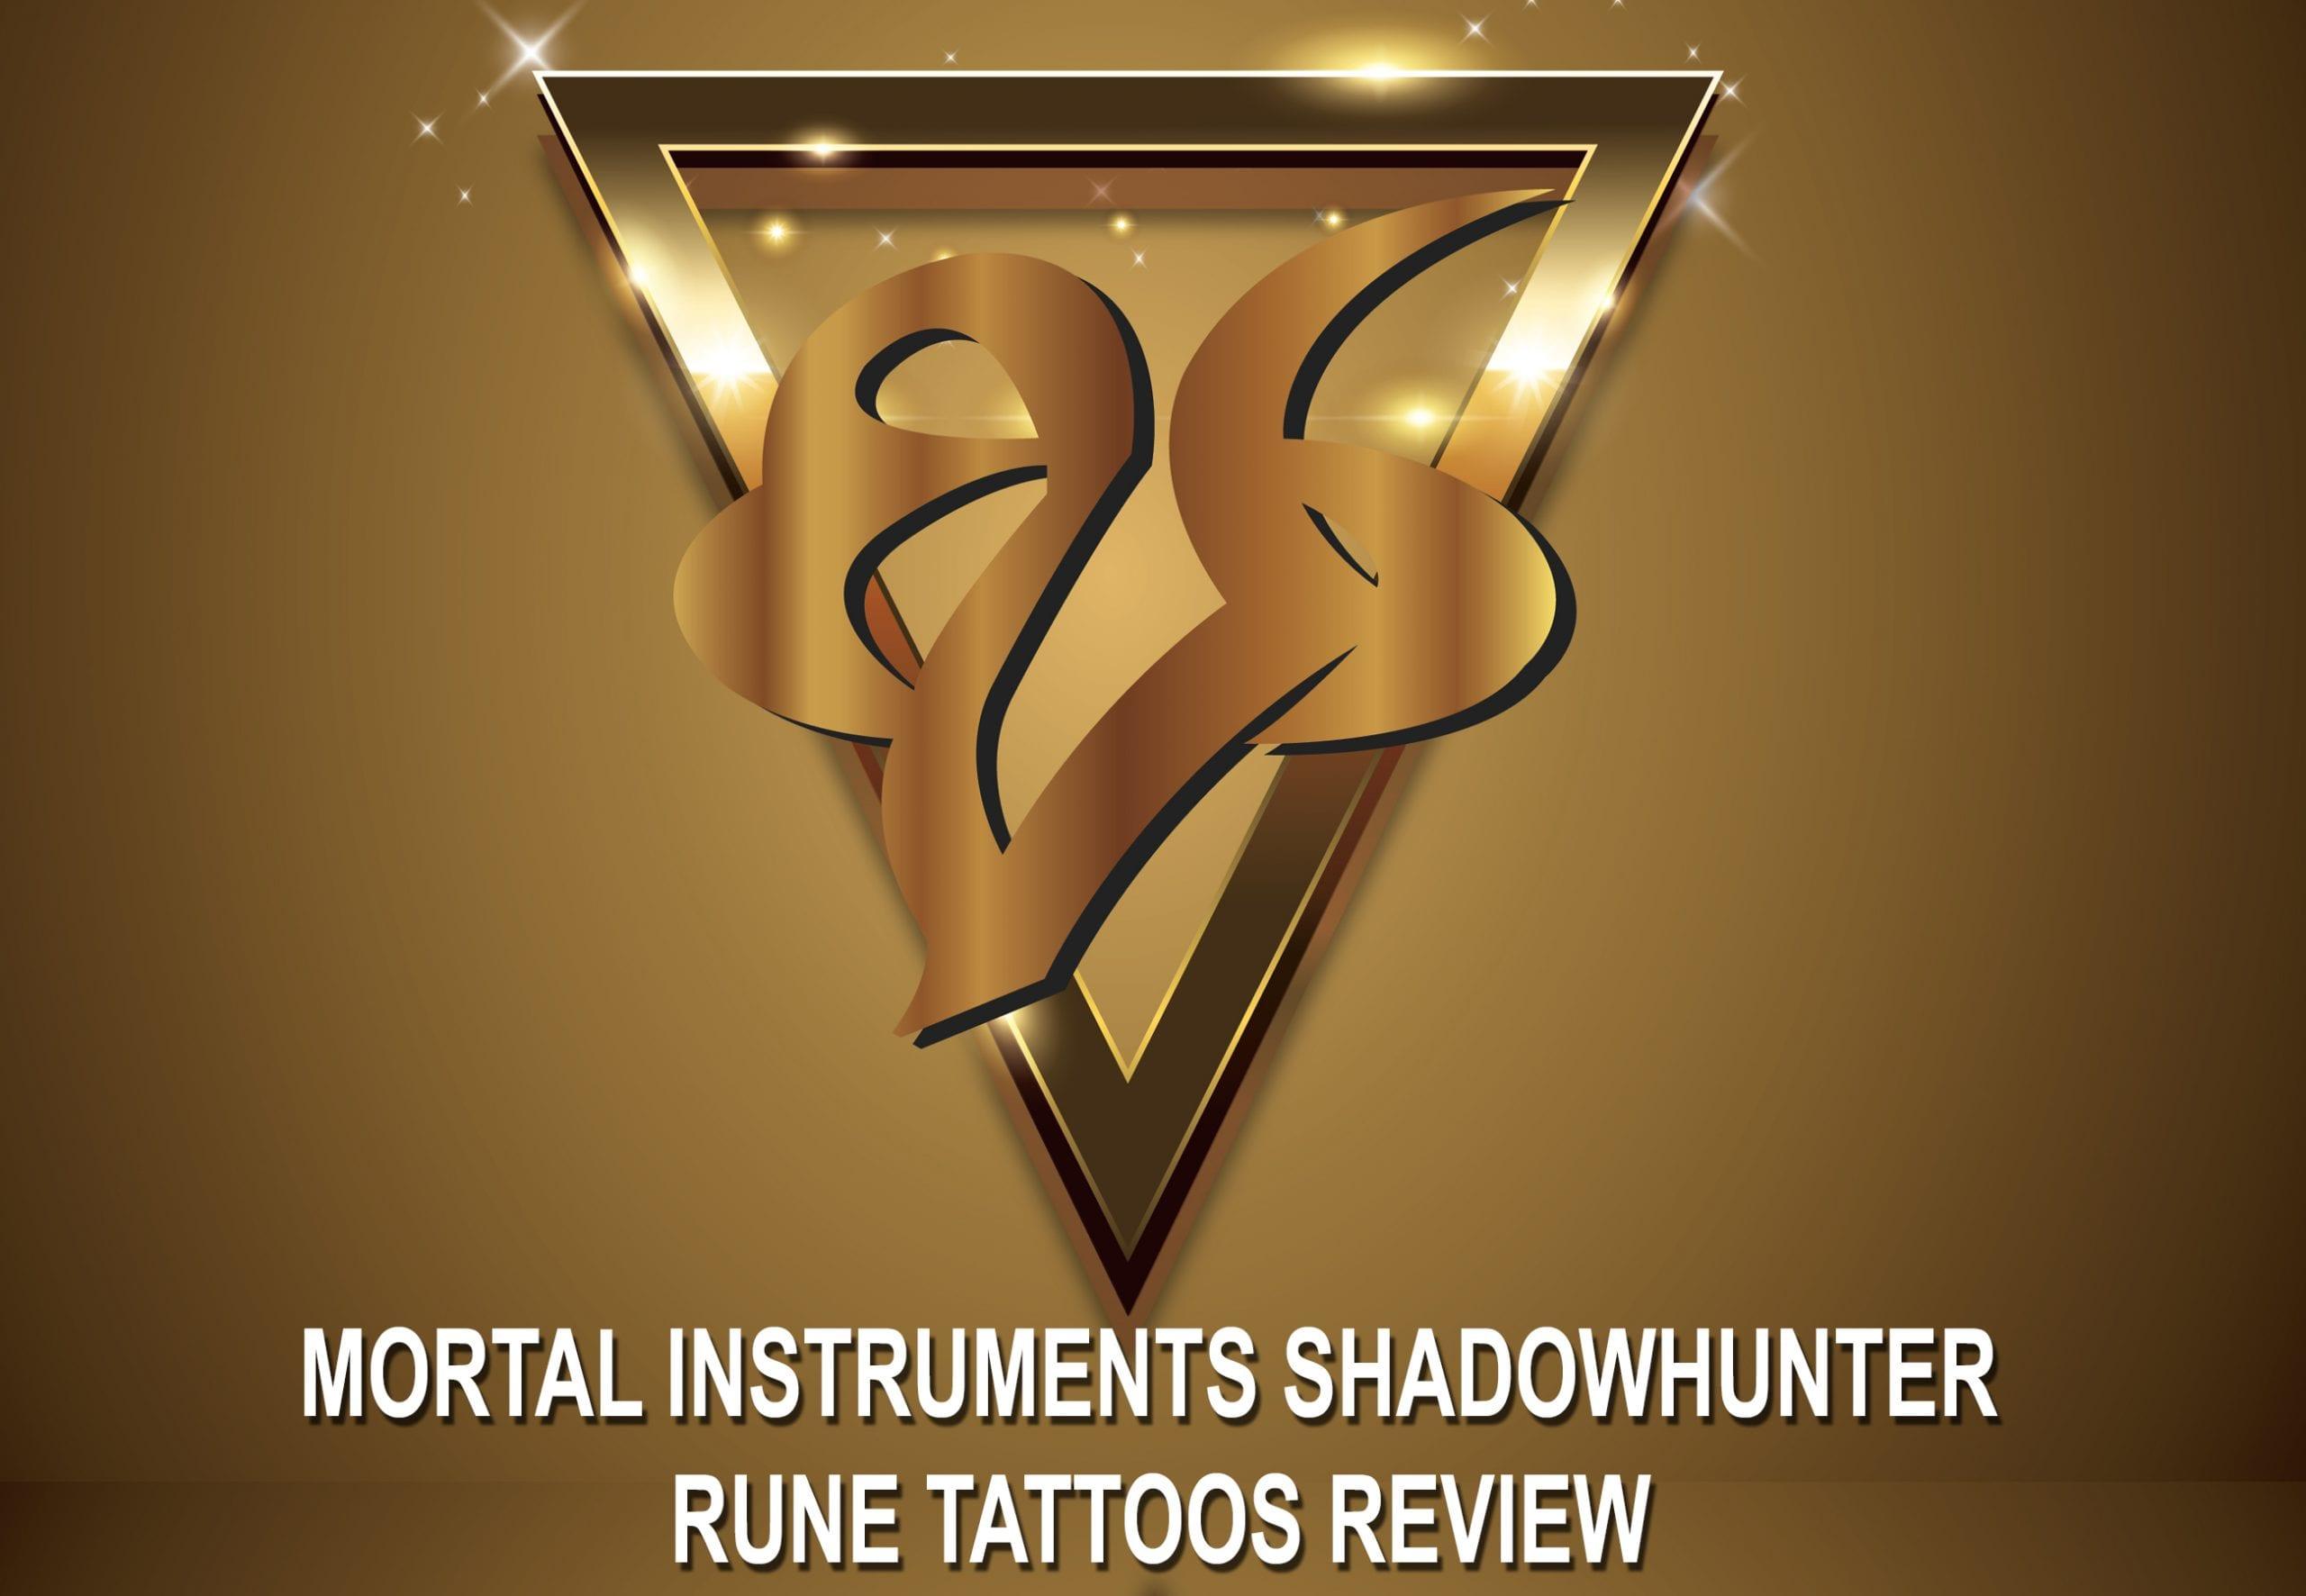 Shadowhunter Rune Tattoos